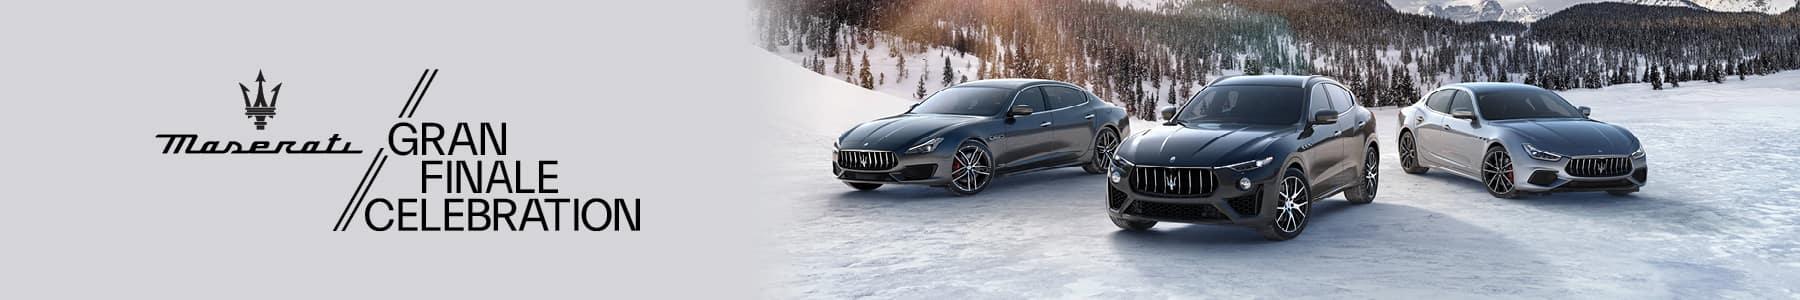 Maserati Lease Offers in Akron Ohio